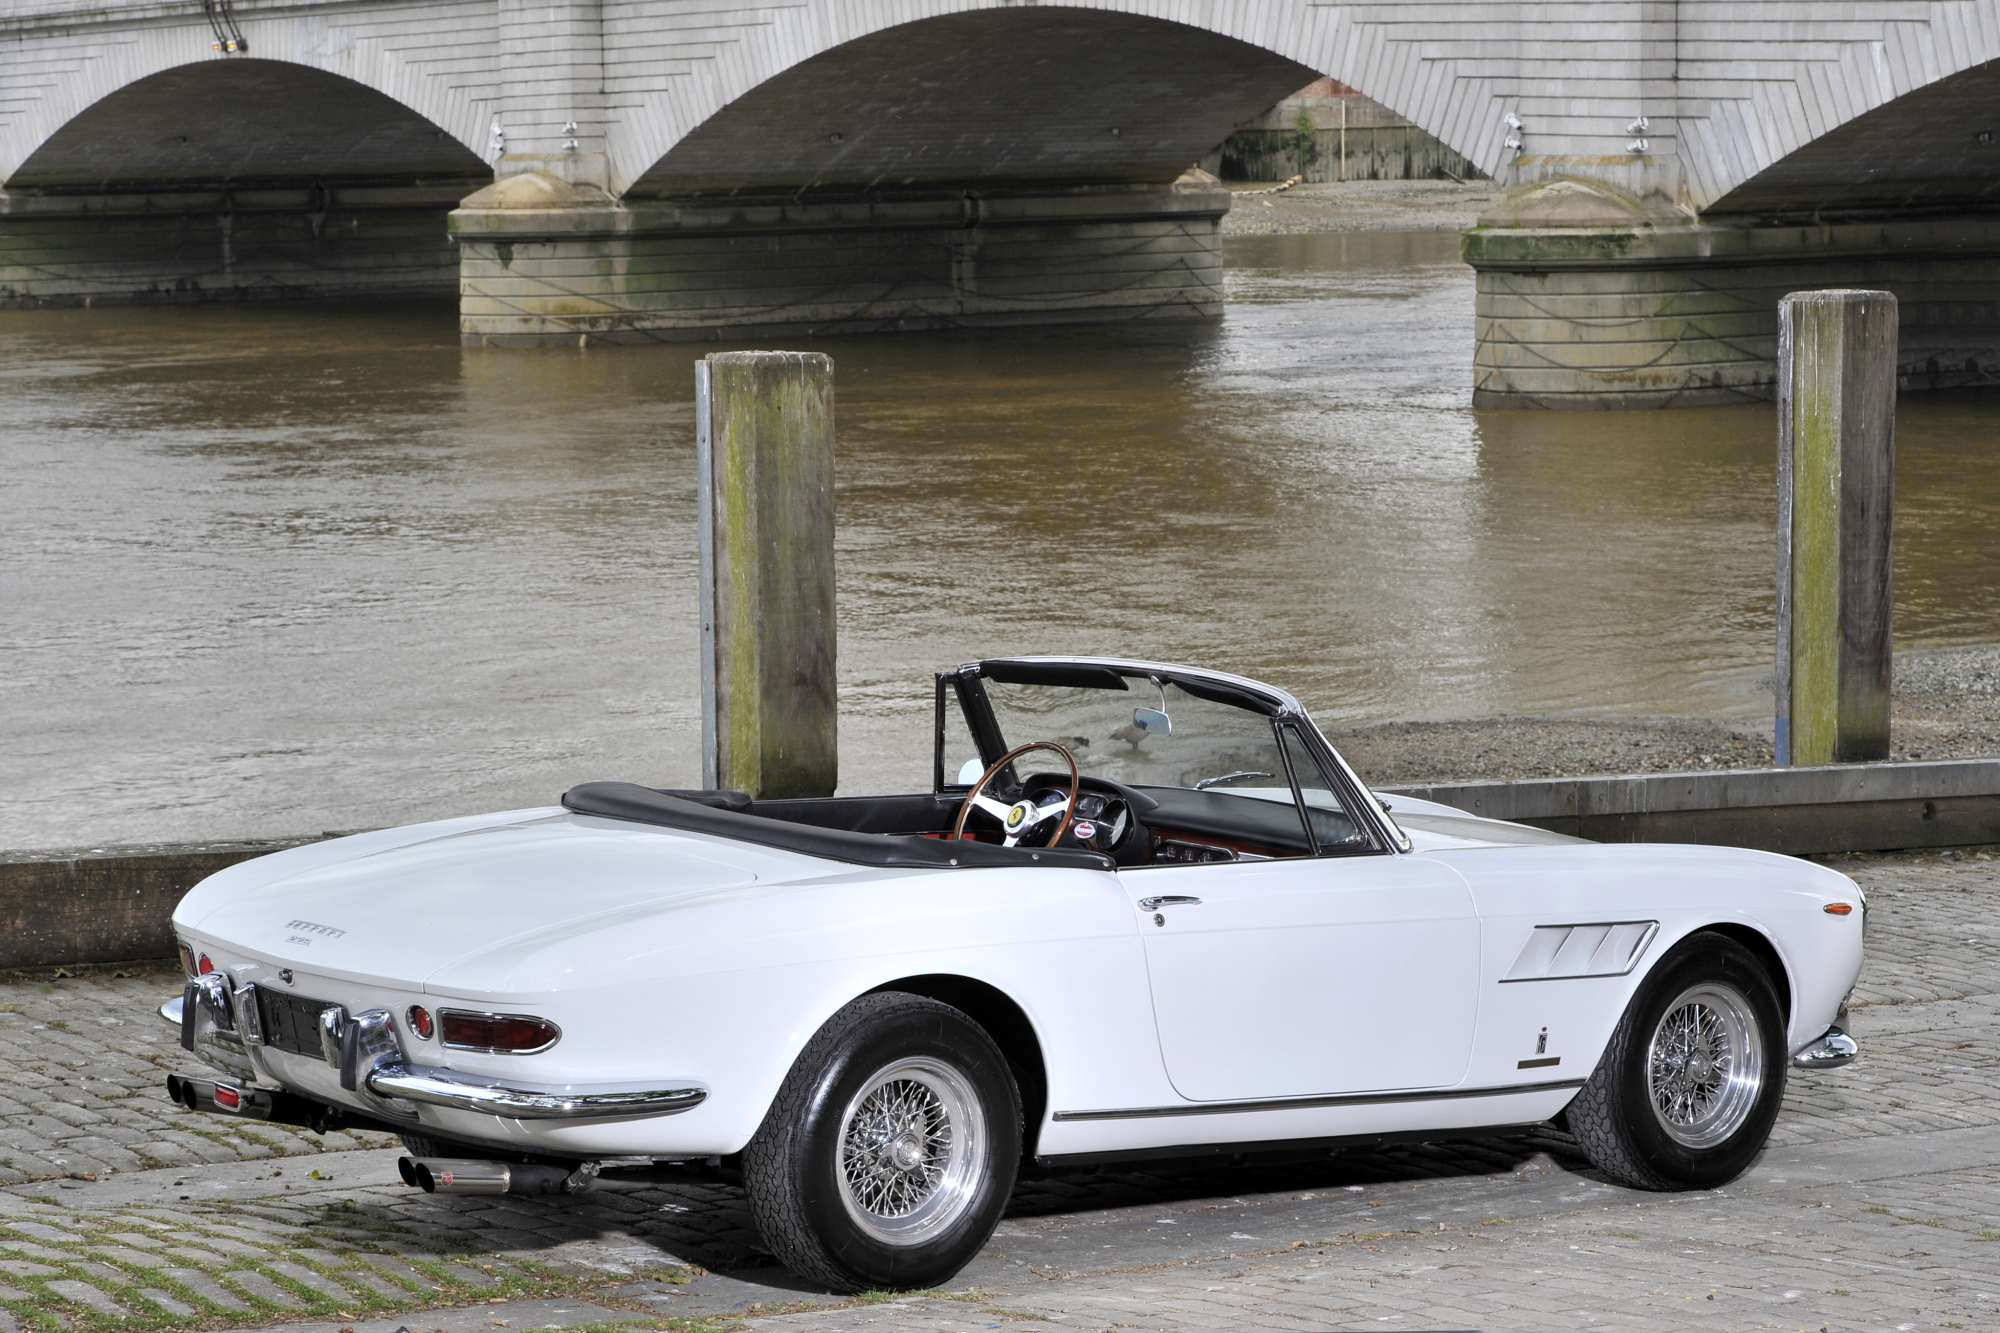 1965 ferrari 275 gts cars for sale fiskens 1965 ferrari 275 gts vanachro Images